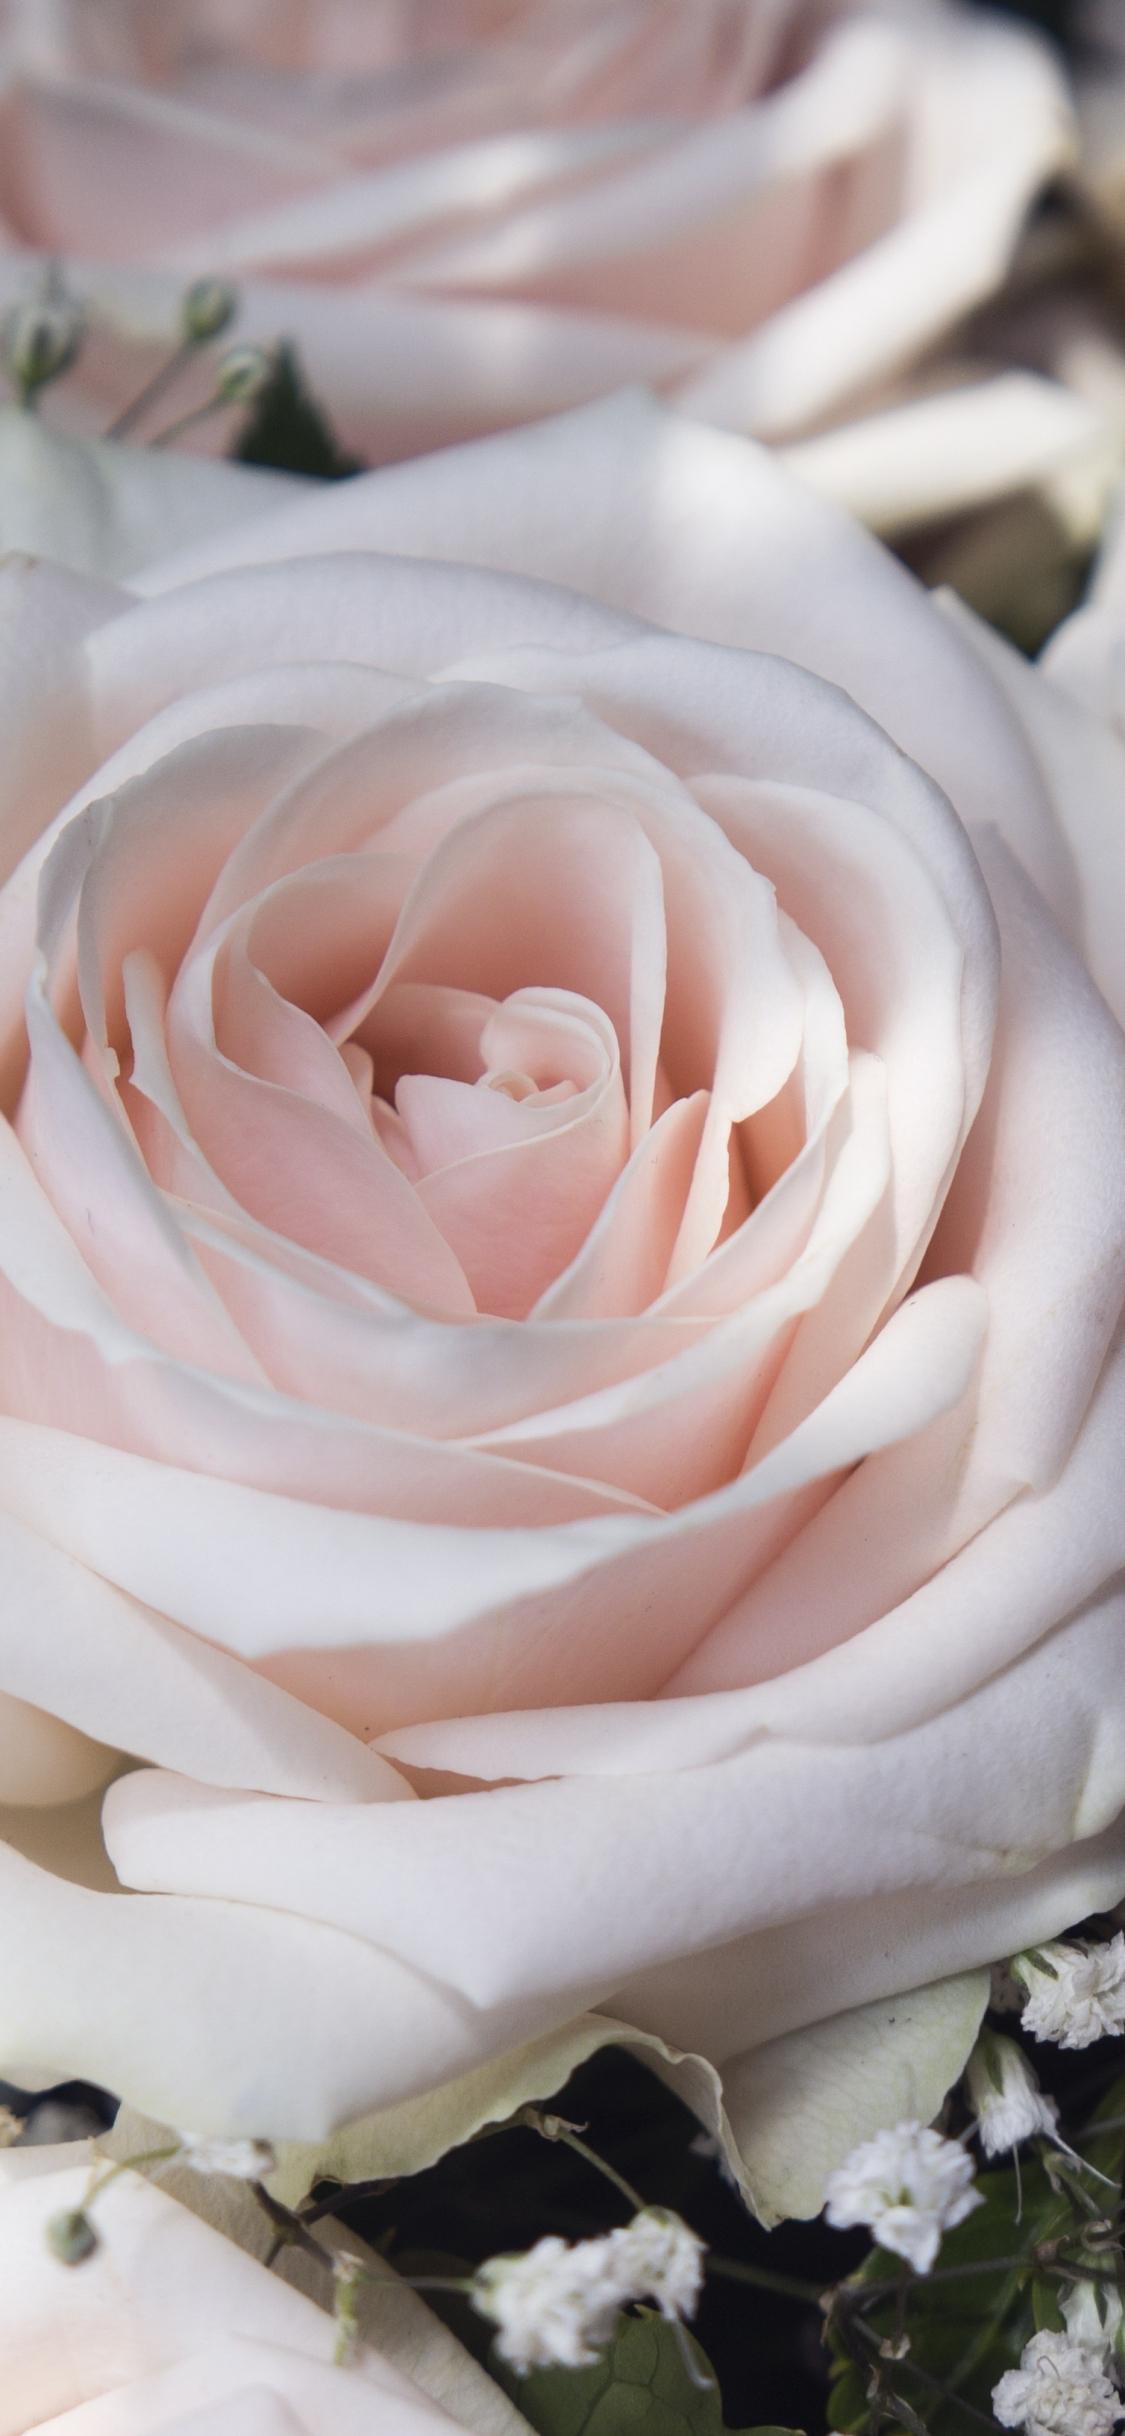 Light Pink Flowers Close Up Roses 1125x2436 Wallpaper